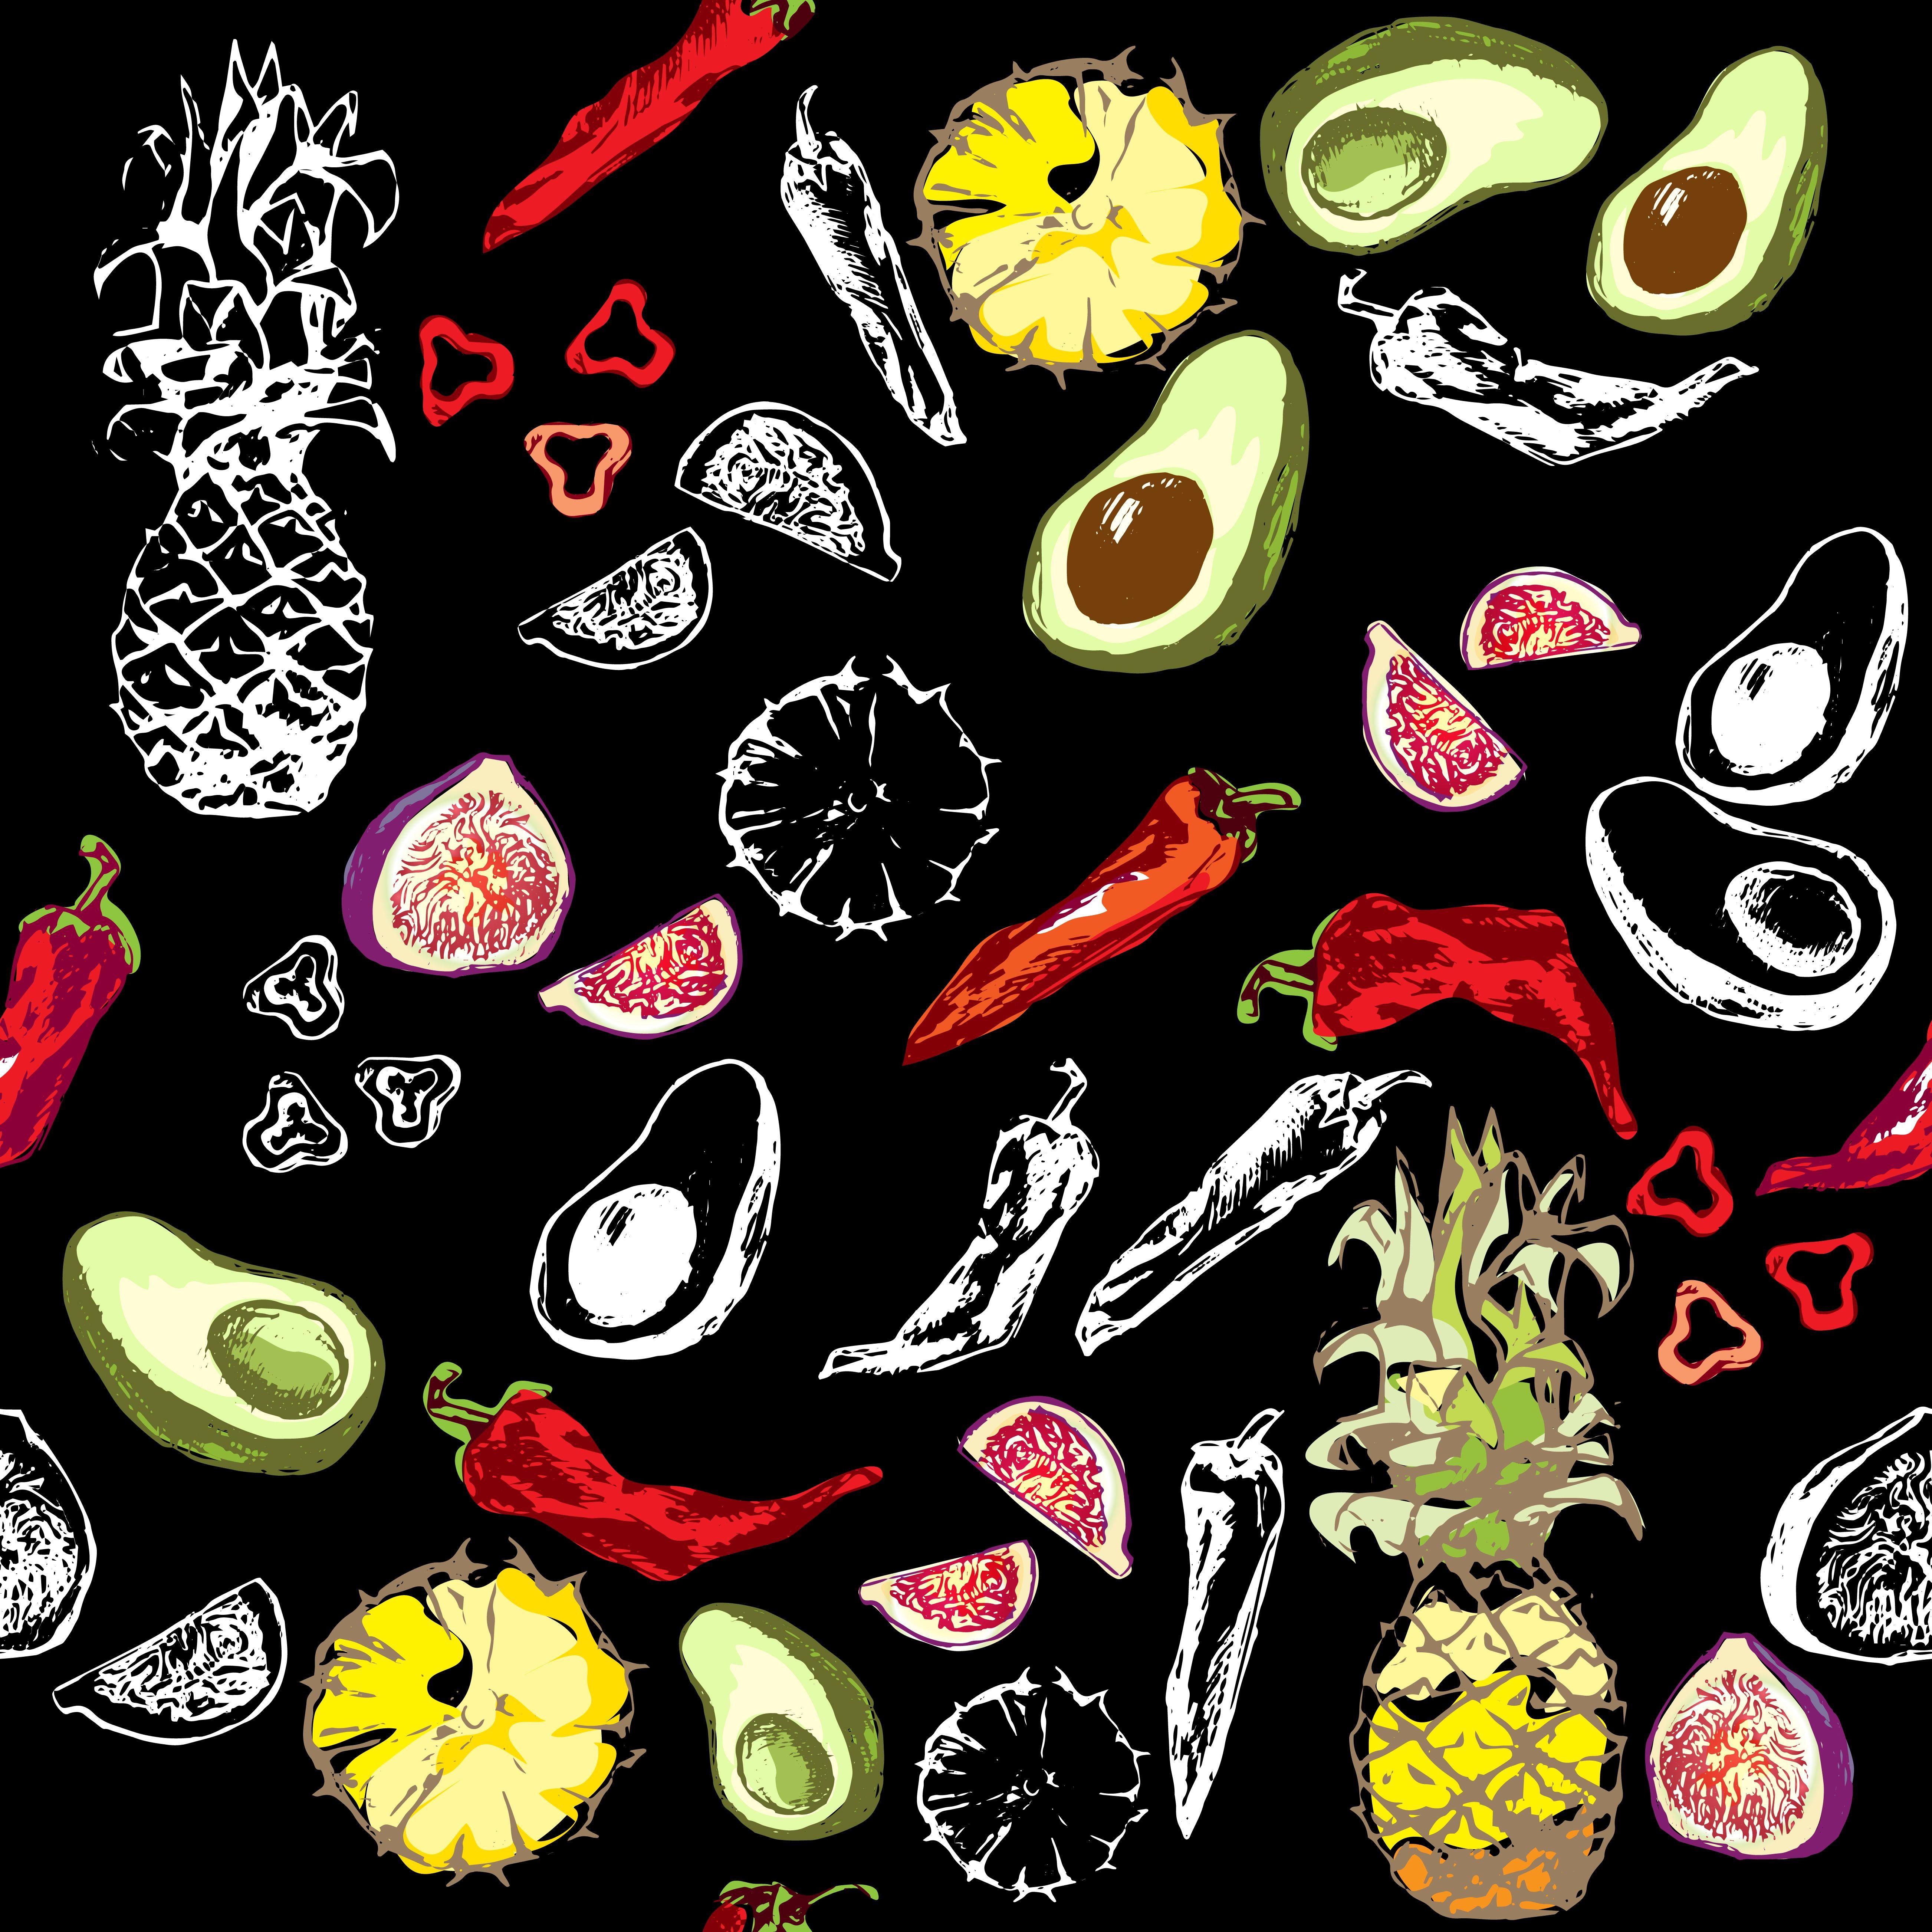 figs, chili pepper, pineapple, avocado, white outline